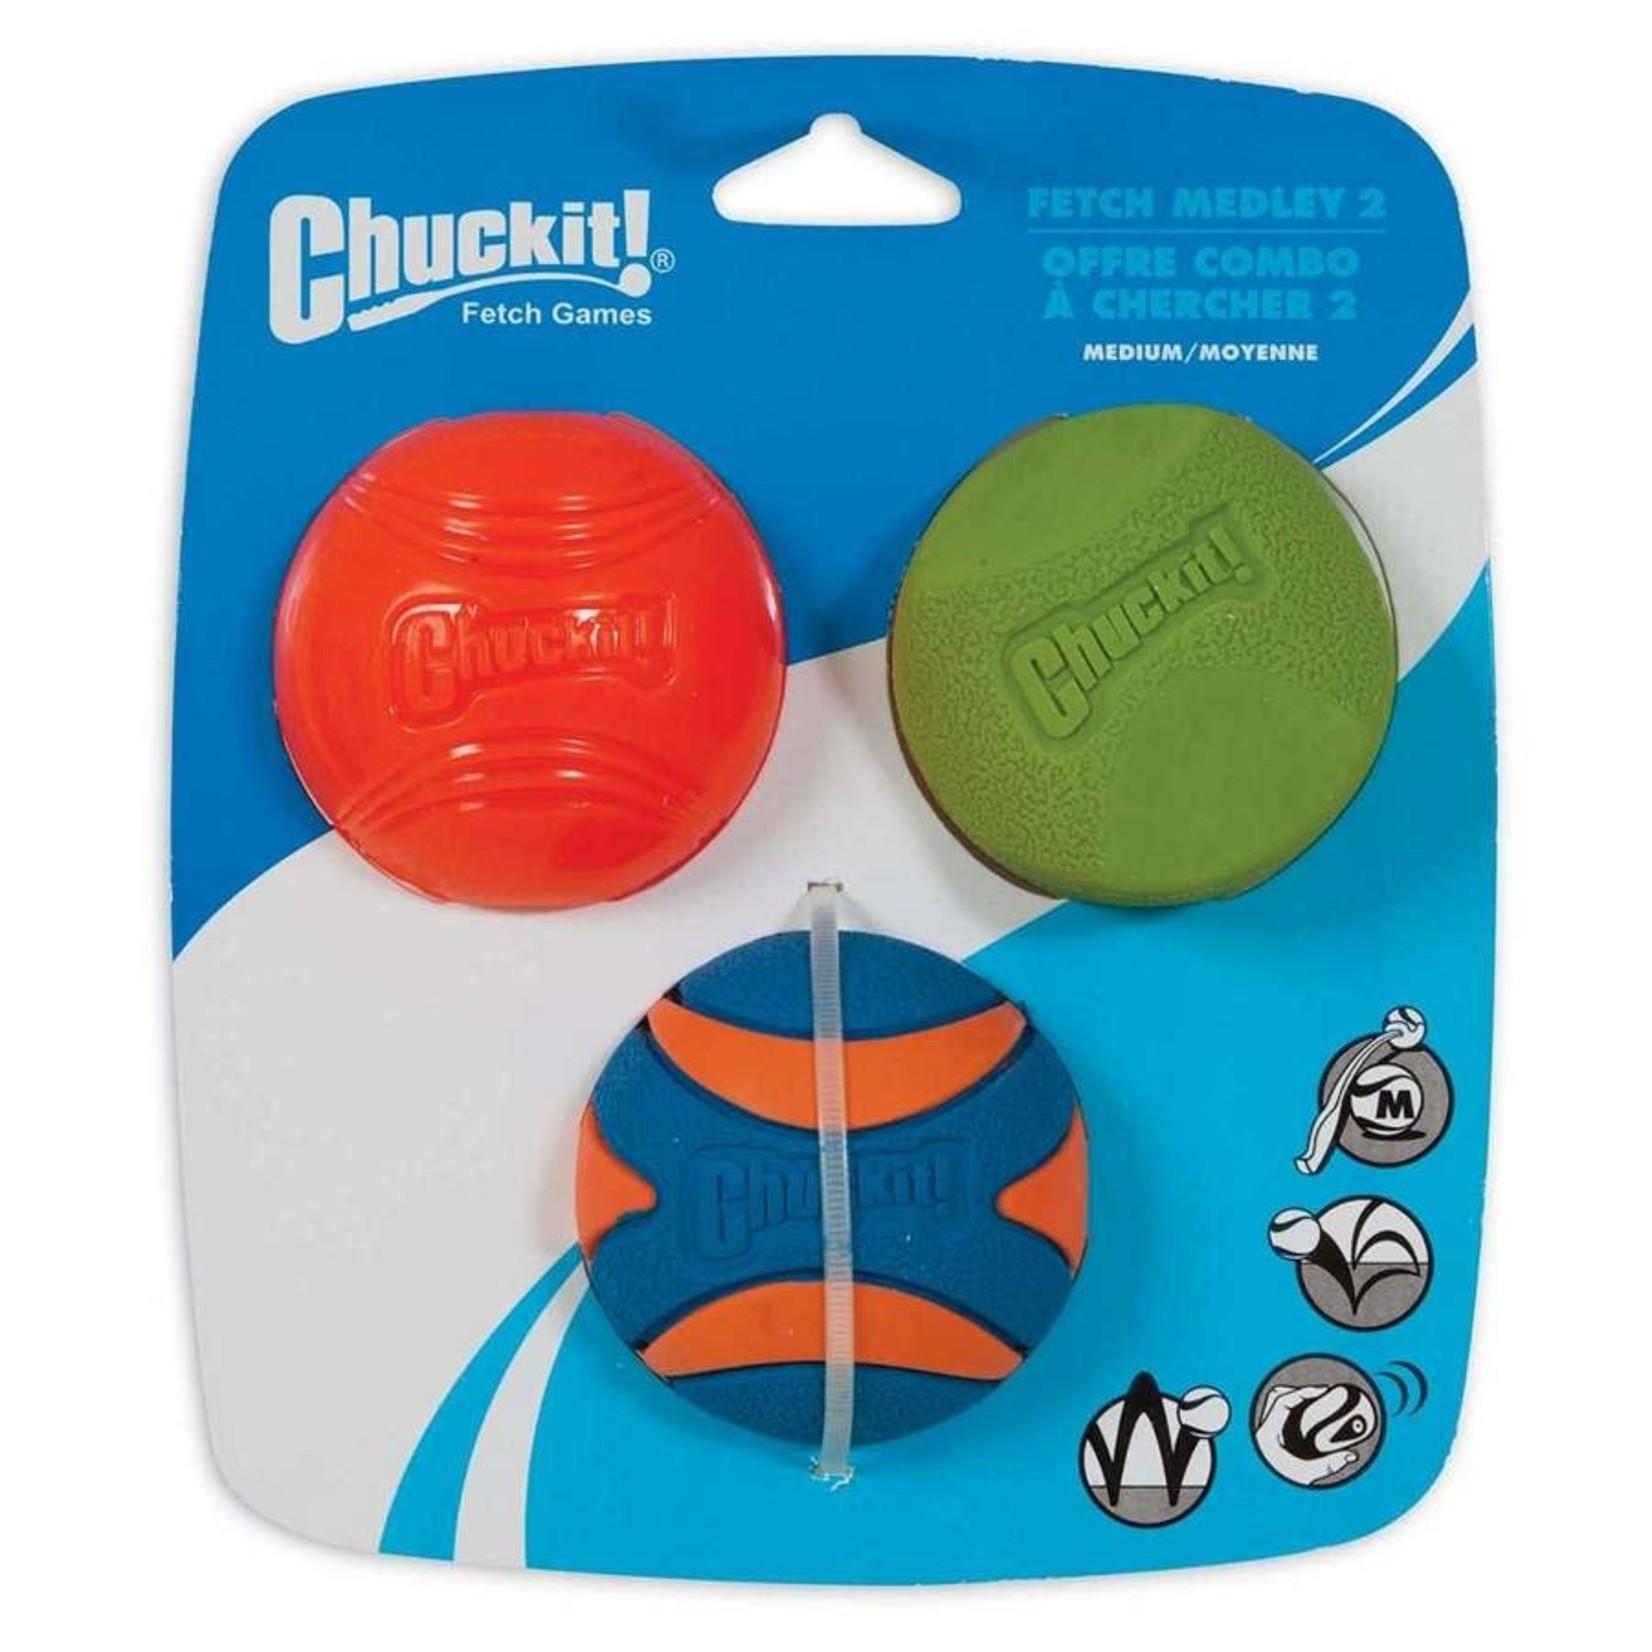 Chuckit Chuckit! Fetch Medley Classic Medium 3Pk Dog Toy